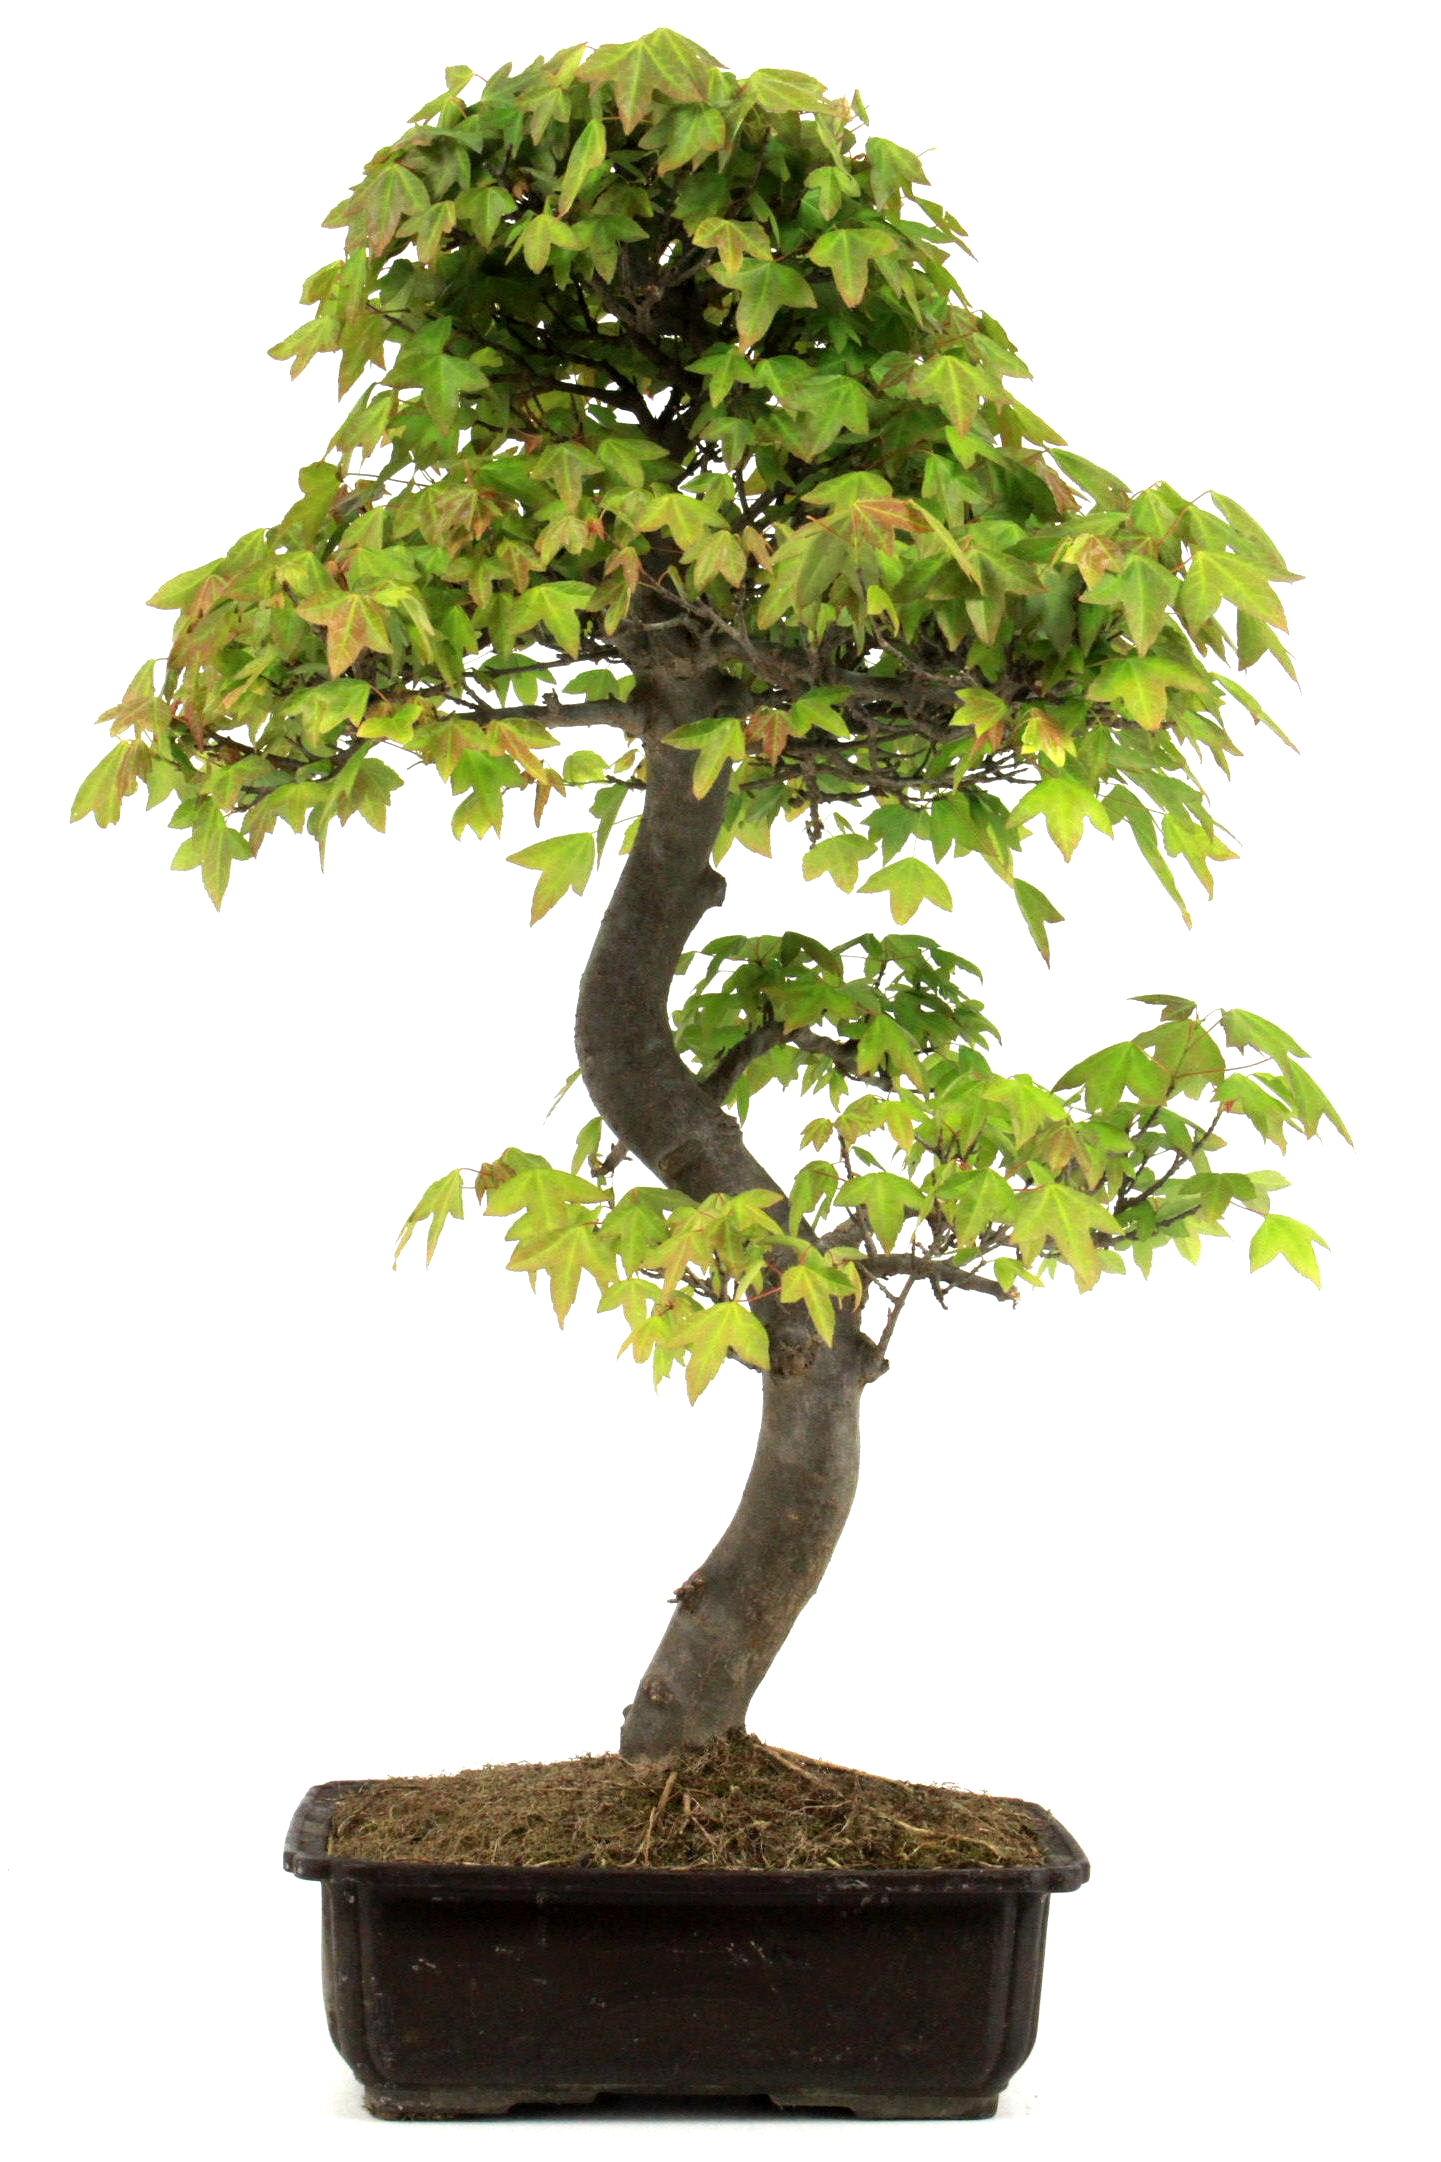 bonsai dreispitz ahorn 68 cm 2611 bei oyaki bonsai kaufen. Black Bedroom Furniture Sets. Home Design Ideas